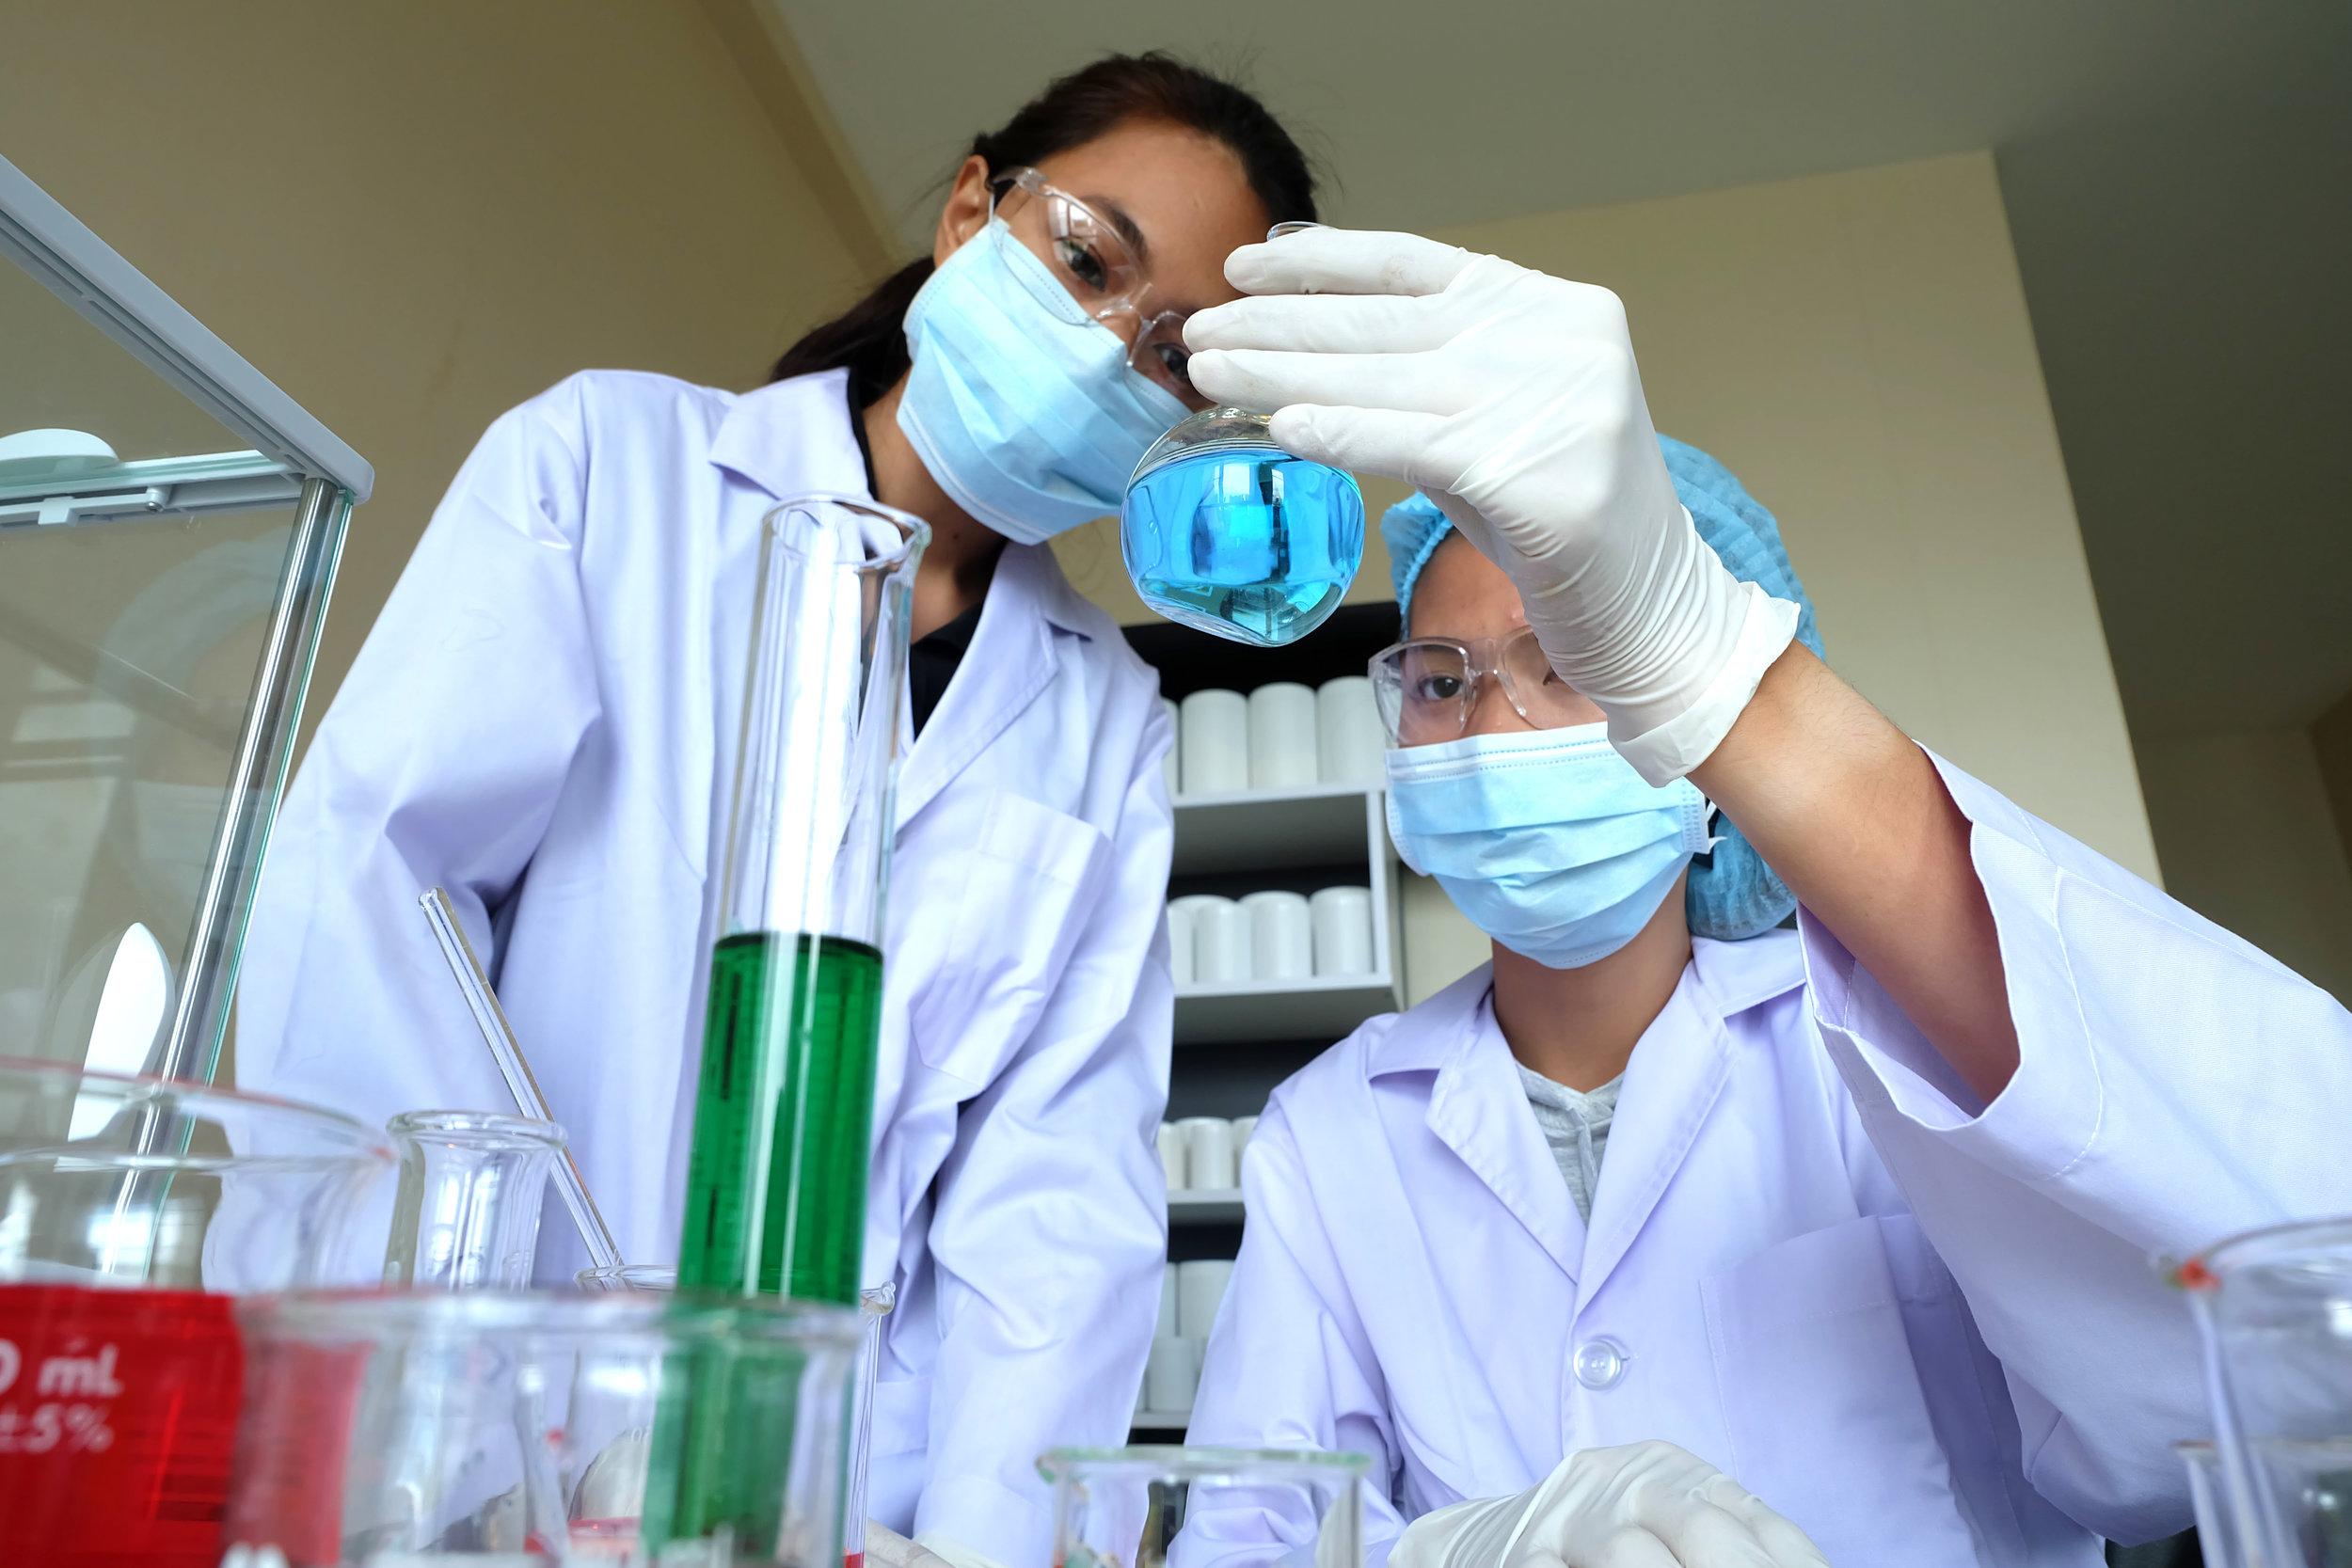 Clinical/Bio-Medical Engineering